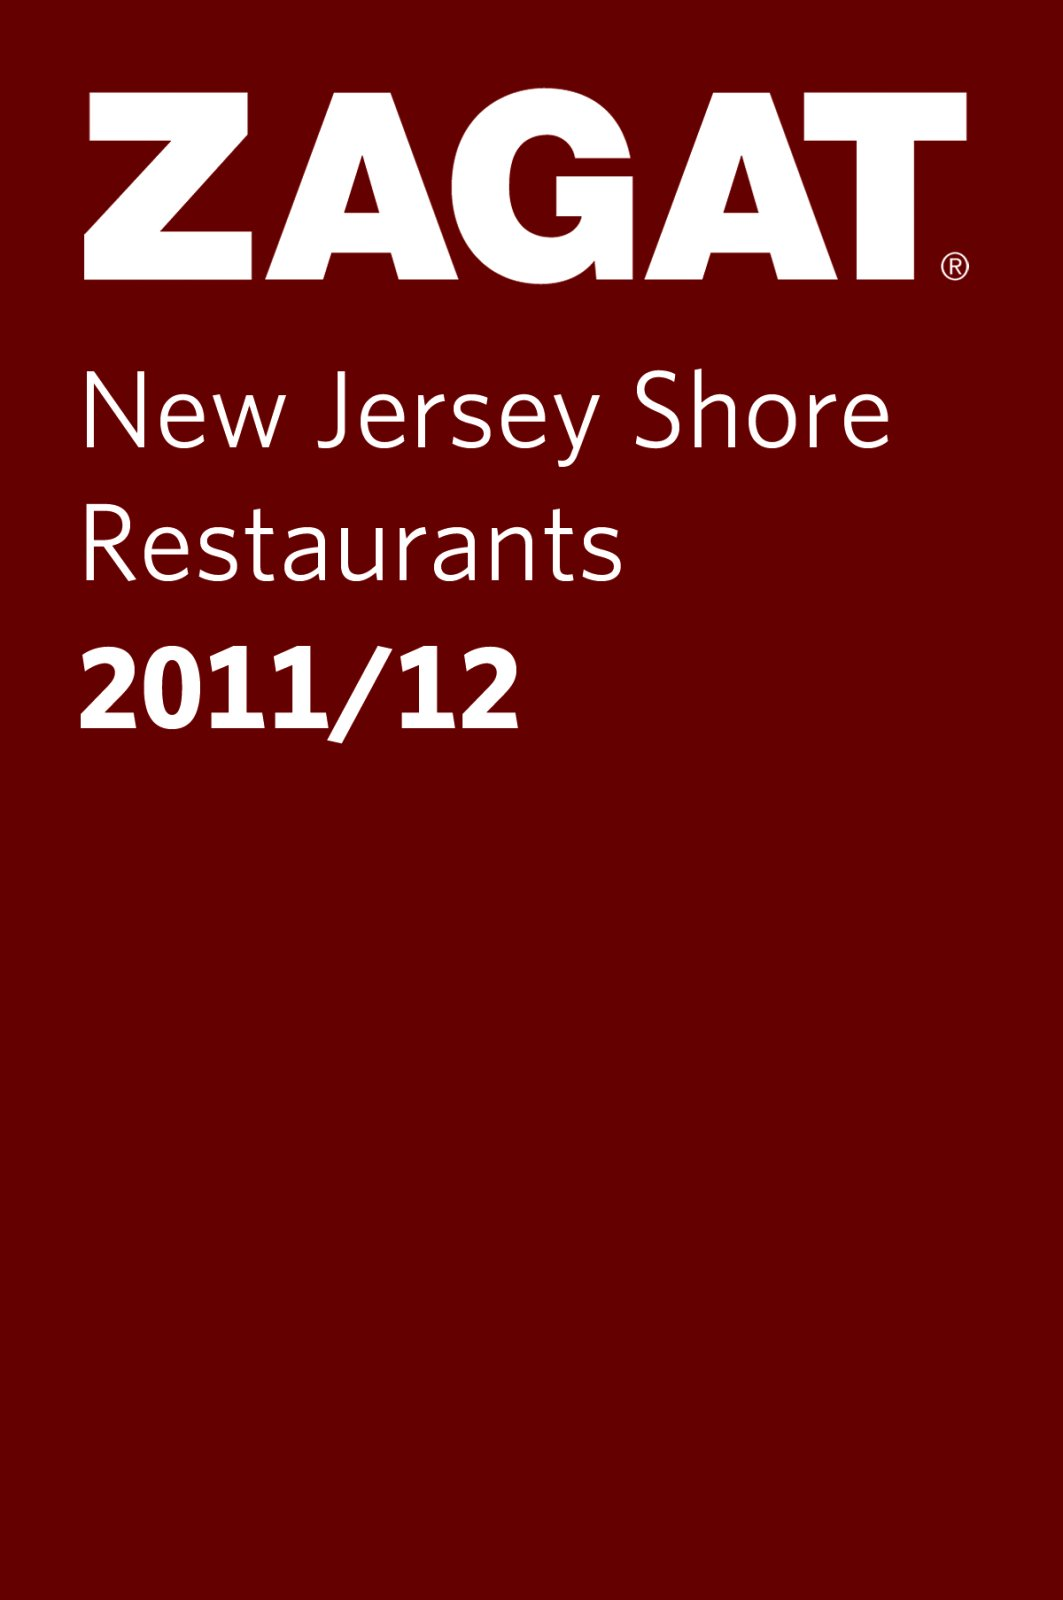 2011/12 New Jersey Shore Restaurants (Pocket Guide) (ZAGAT Pocket Guides) PDF